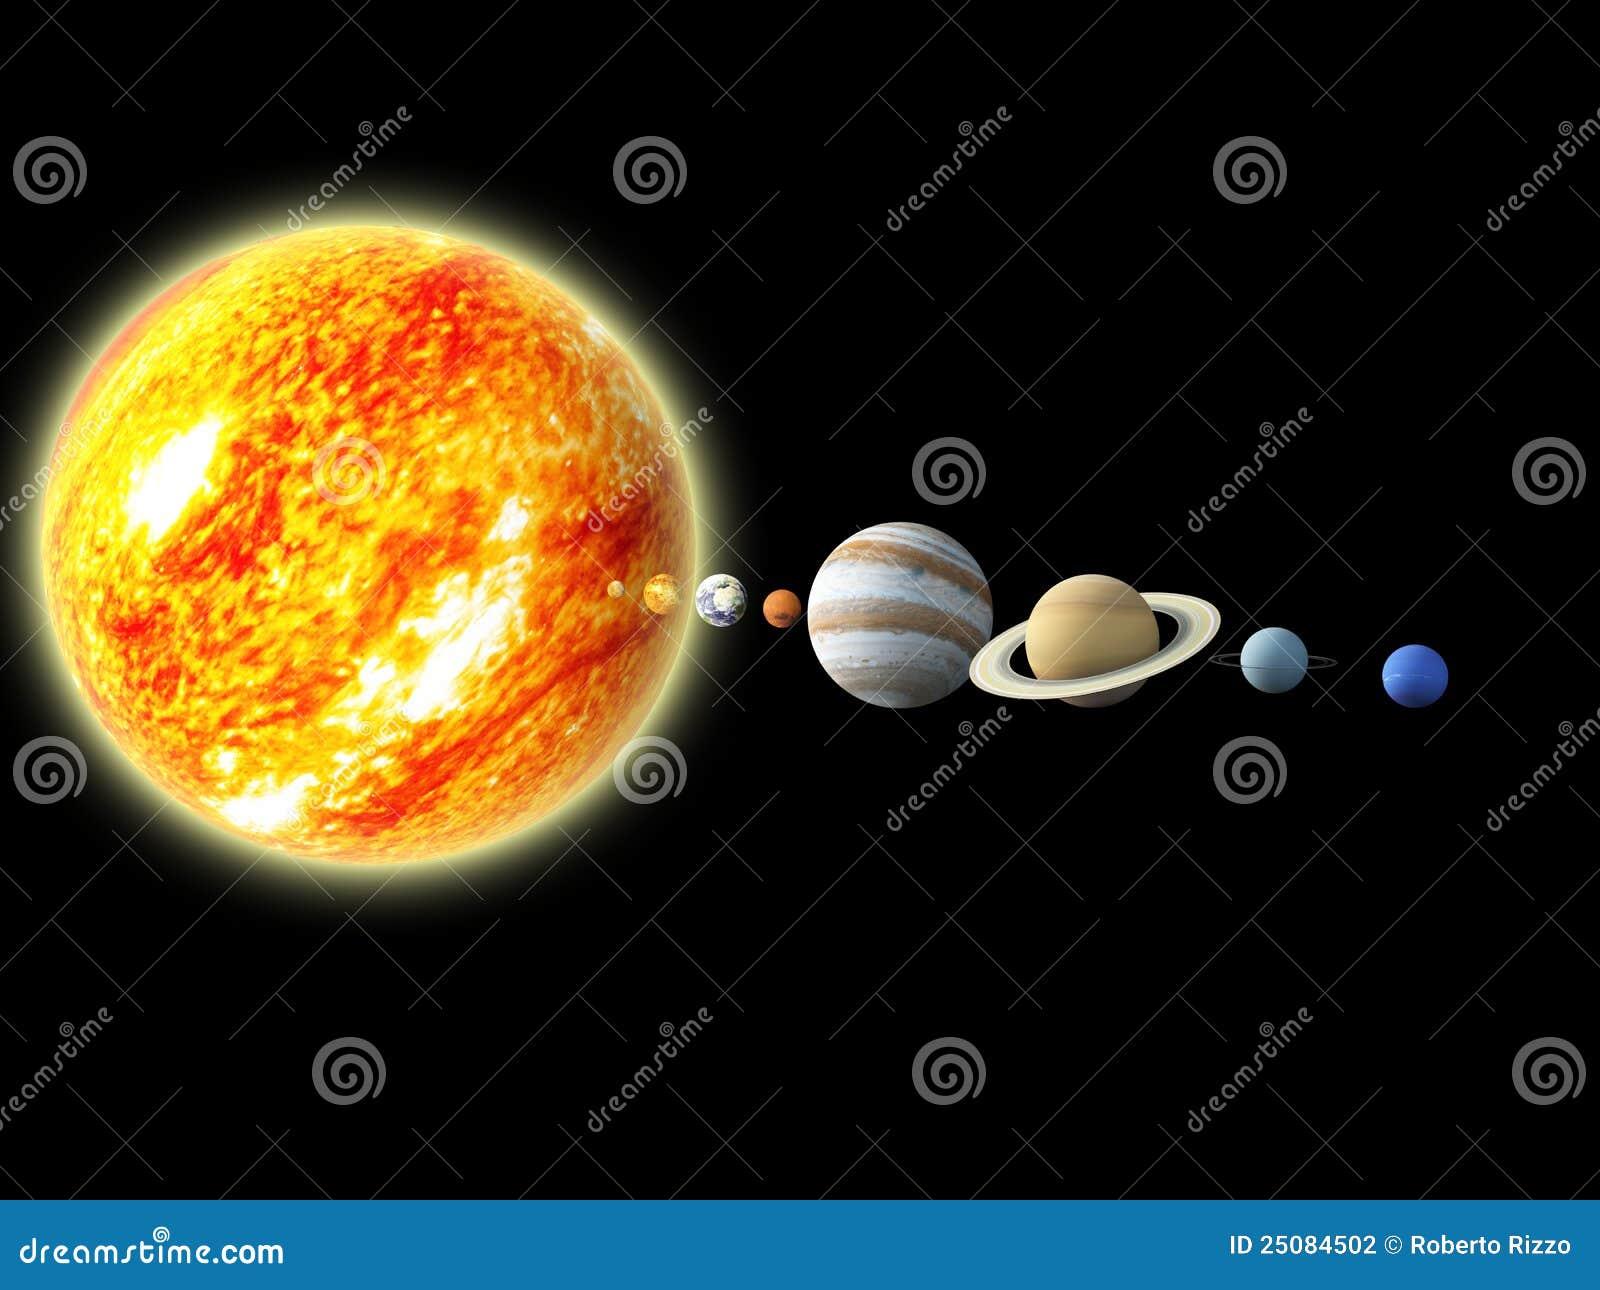 solar system map 3d - photo #1